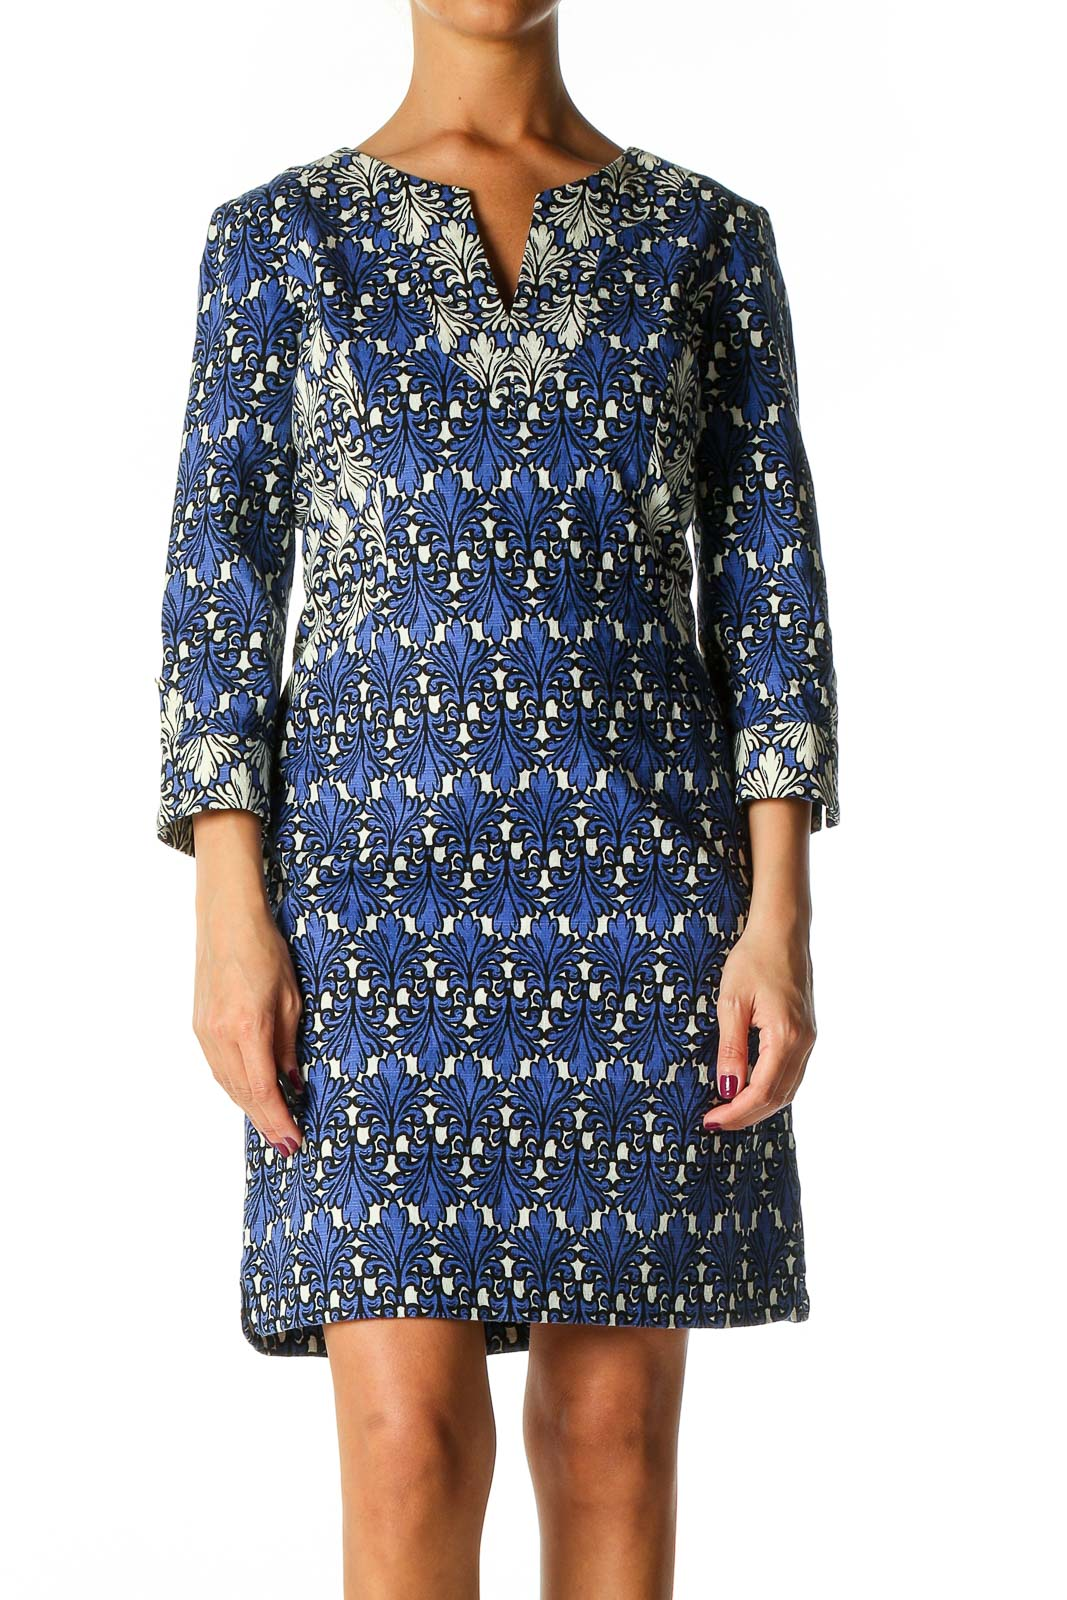 Blue Textured Bohemian Shift Dress Front